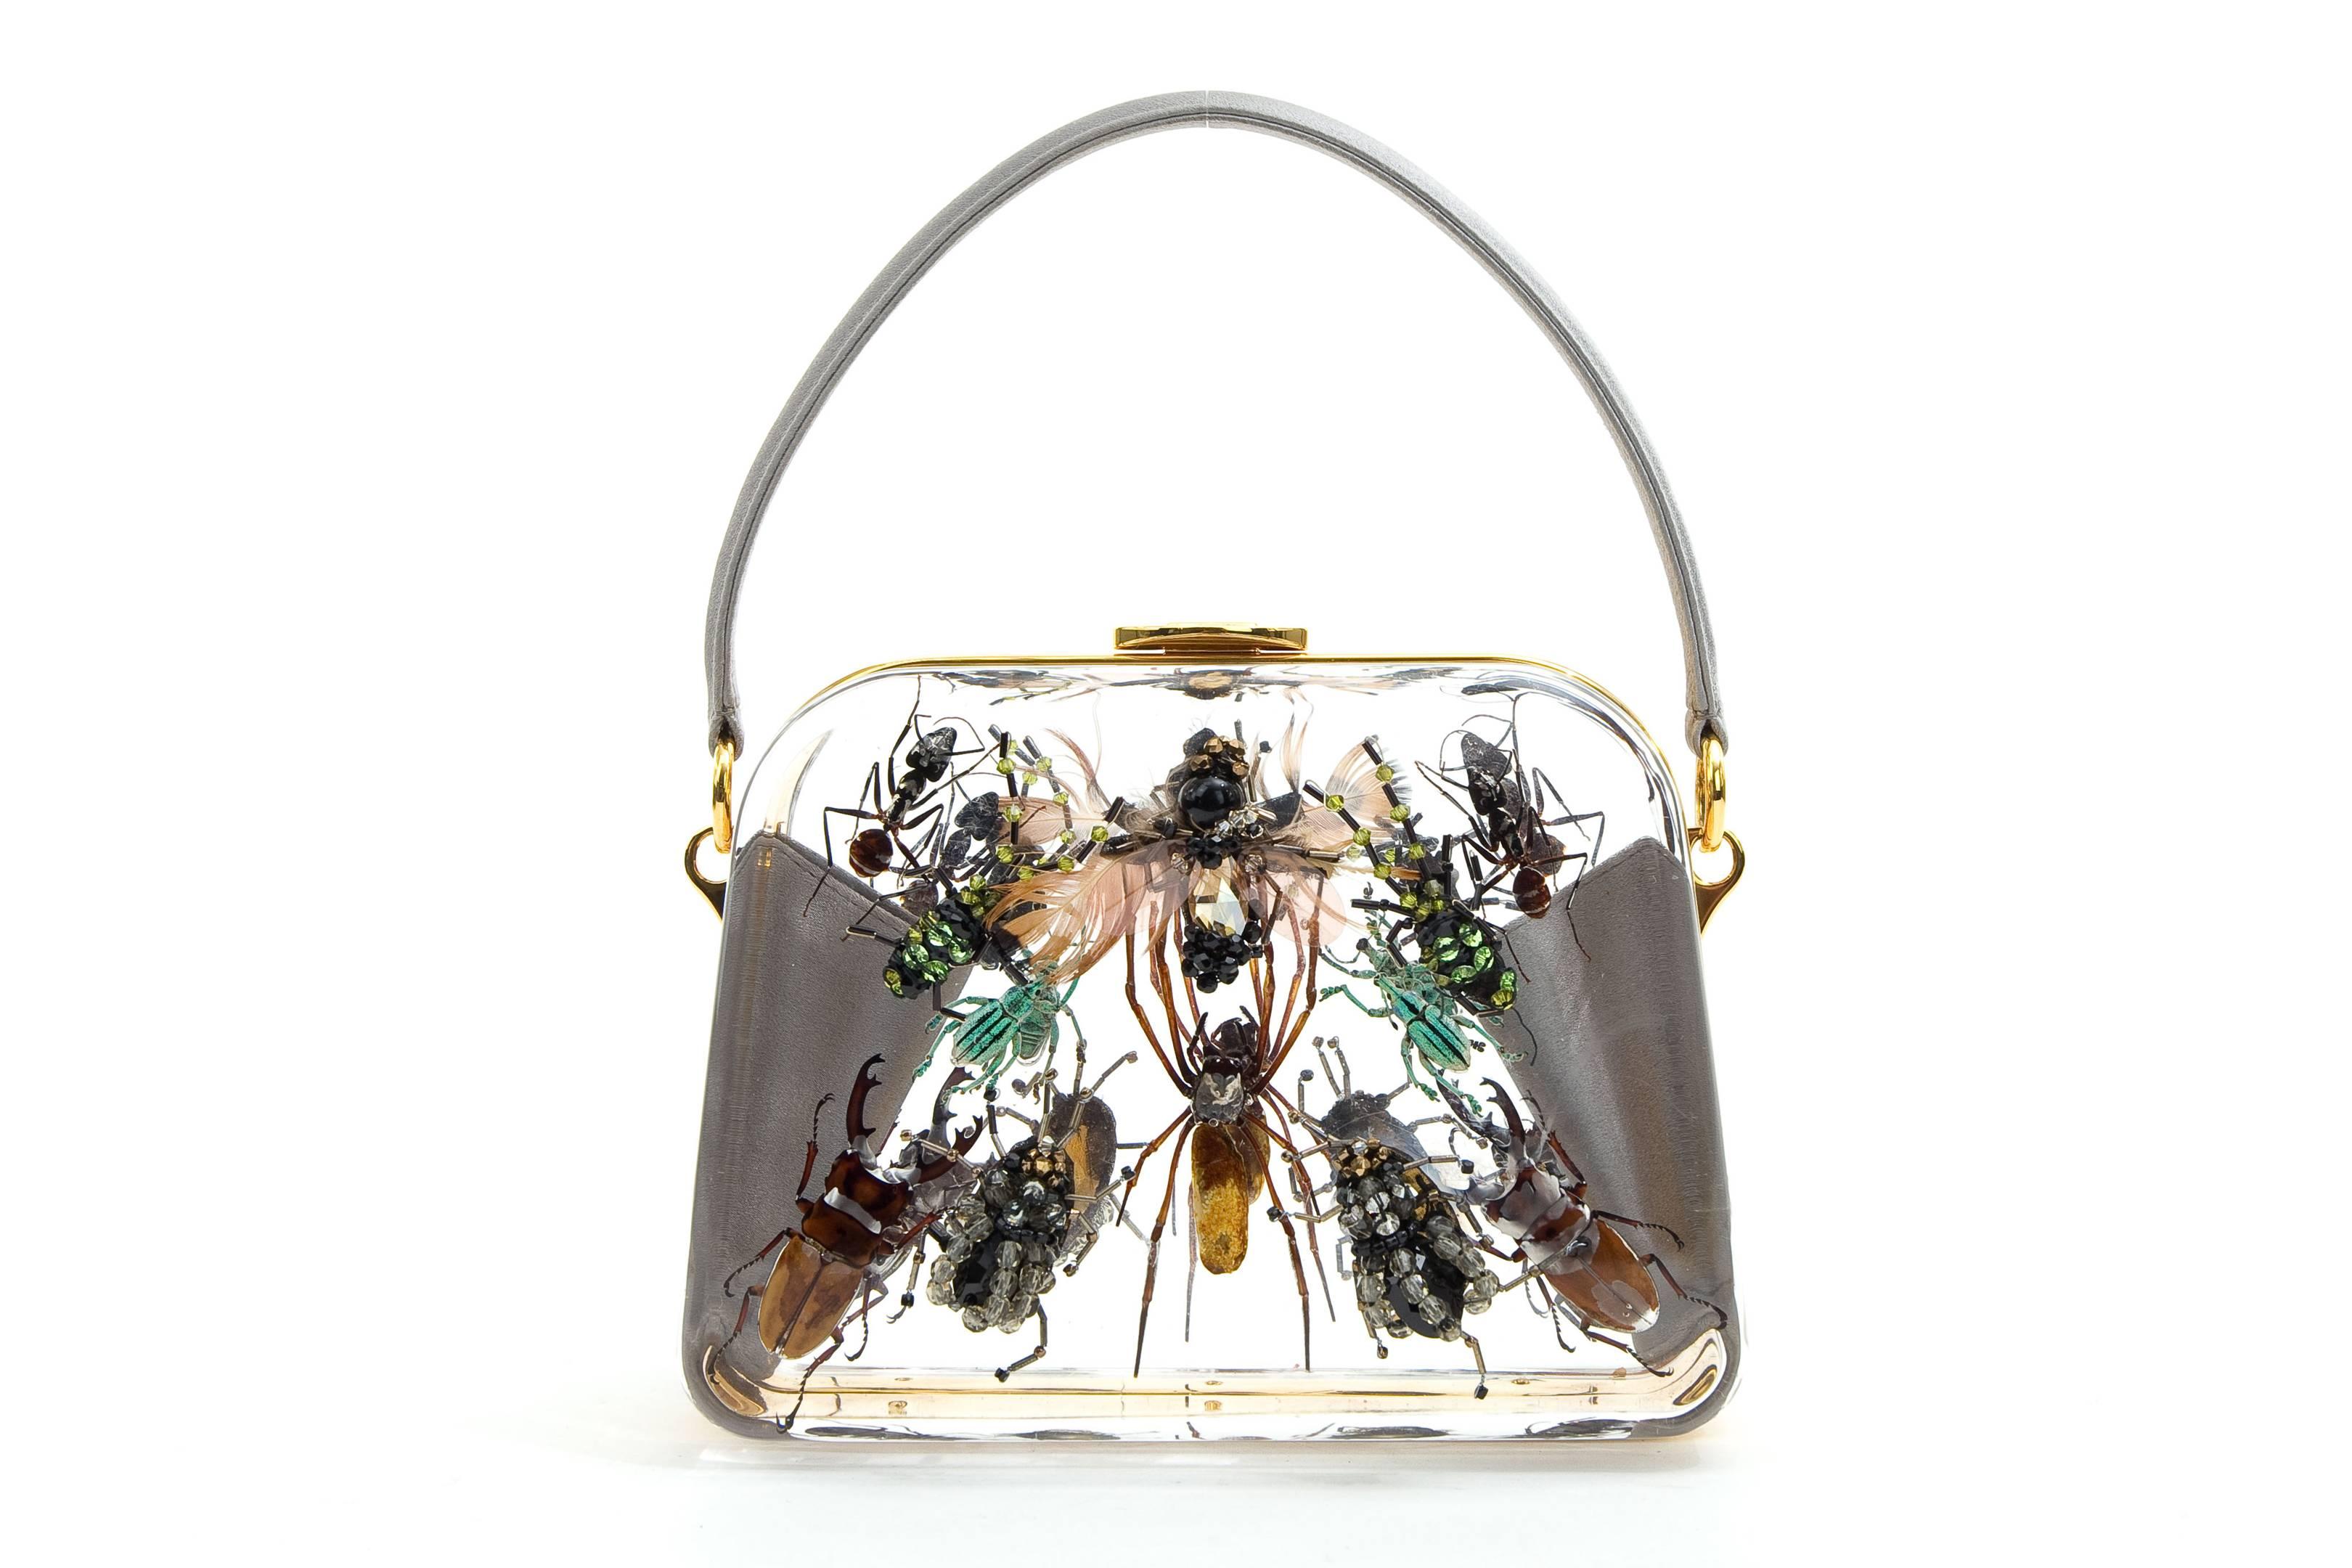 60ea4afecbcb8a Handbag History: 13 Art and Fashion Collaborations You Must Know | British  Vogue